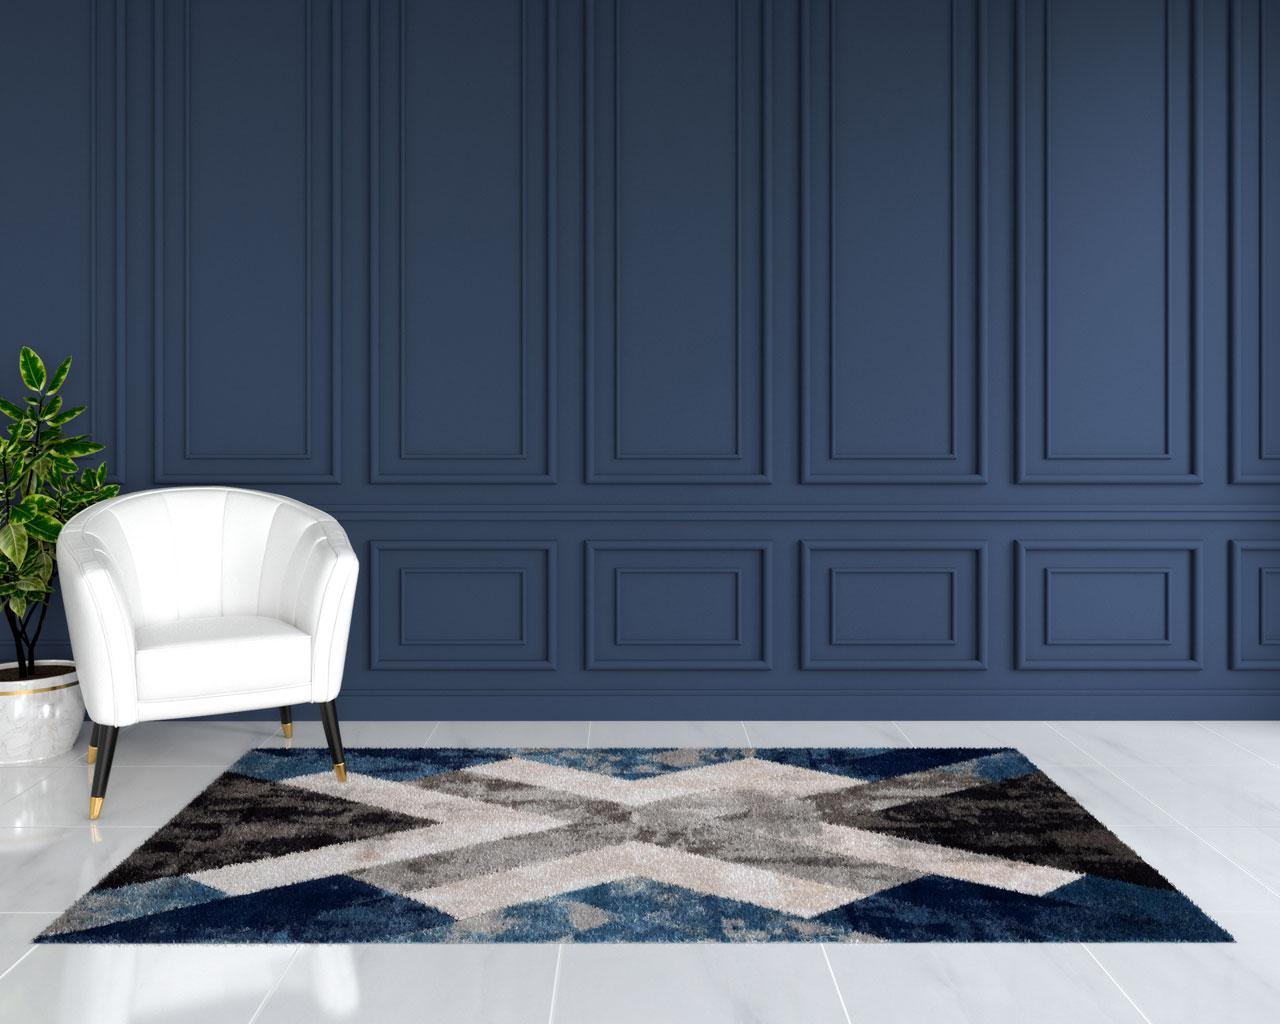 Black and blue rug